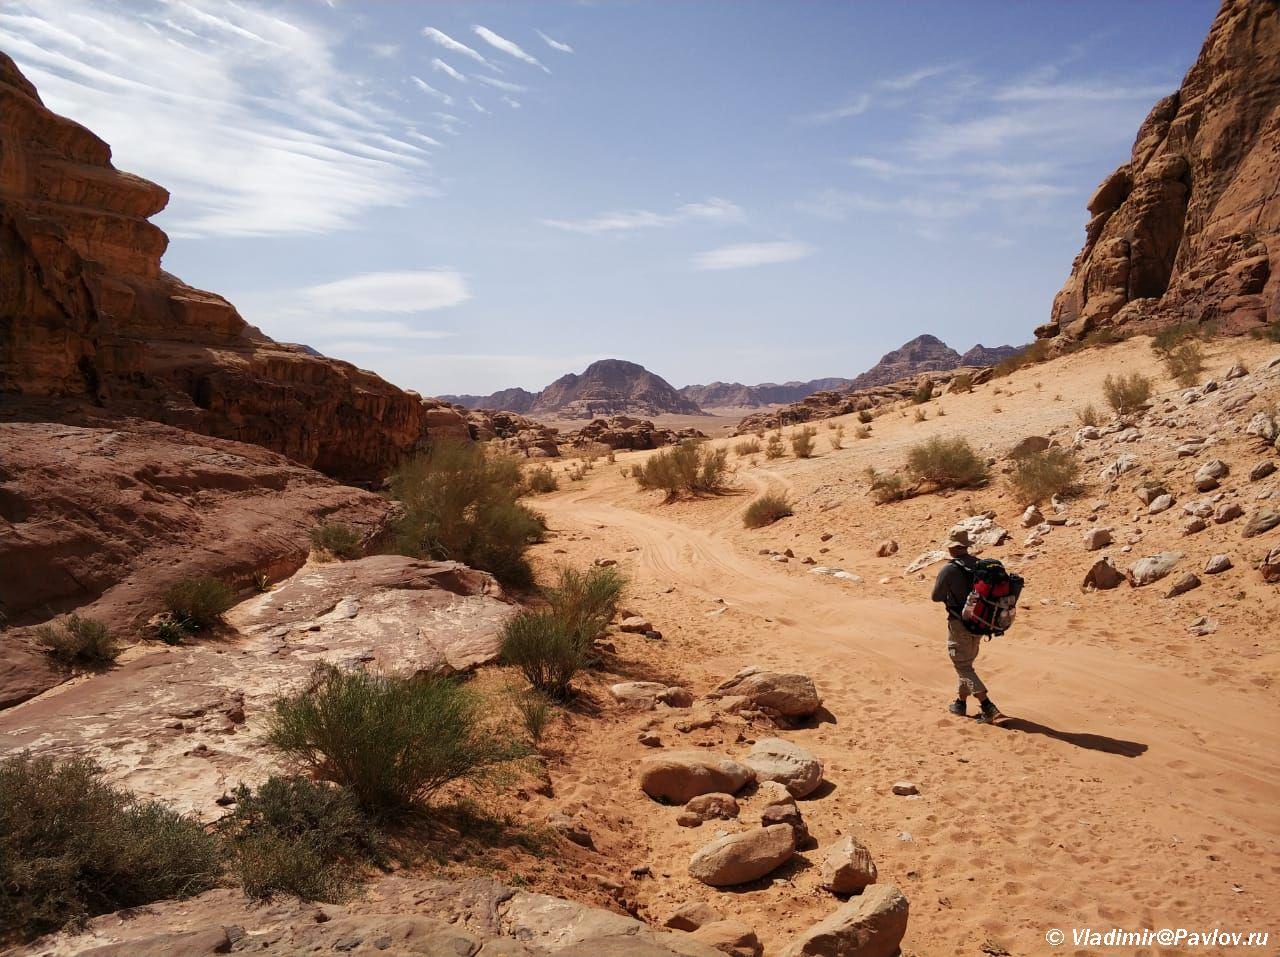 Samostoyatelno s palatkoj po pustyne Vadi Ram Wadi Rum - Самостоятельно в пустыню Вади Рам (Wadi Rum), с палаткой